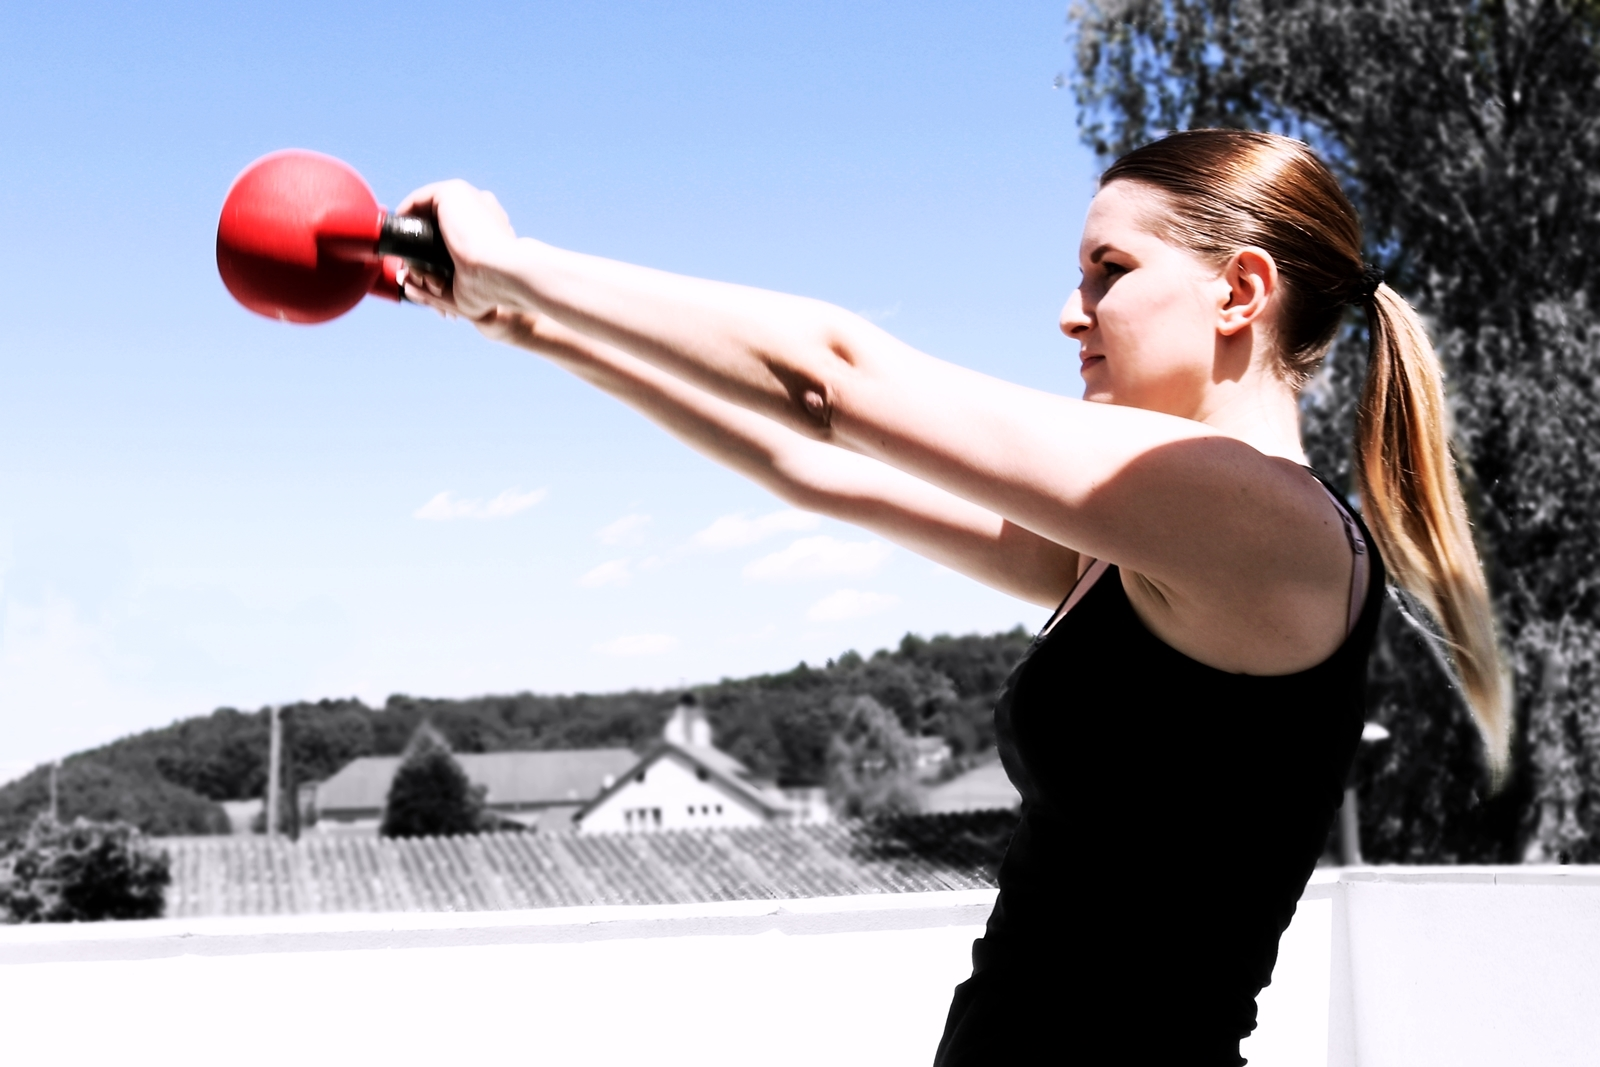 Kettlebell Training - effektiver Sport - Ganzkörper Training - Fashionladyloves by Tamara Wagner - Lifestyleblog